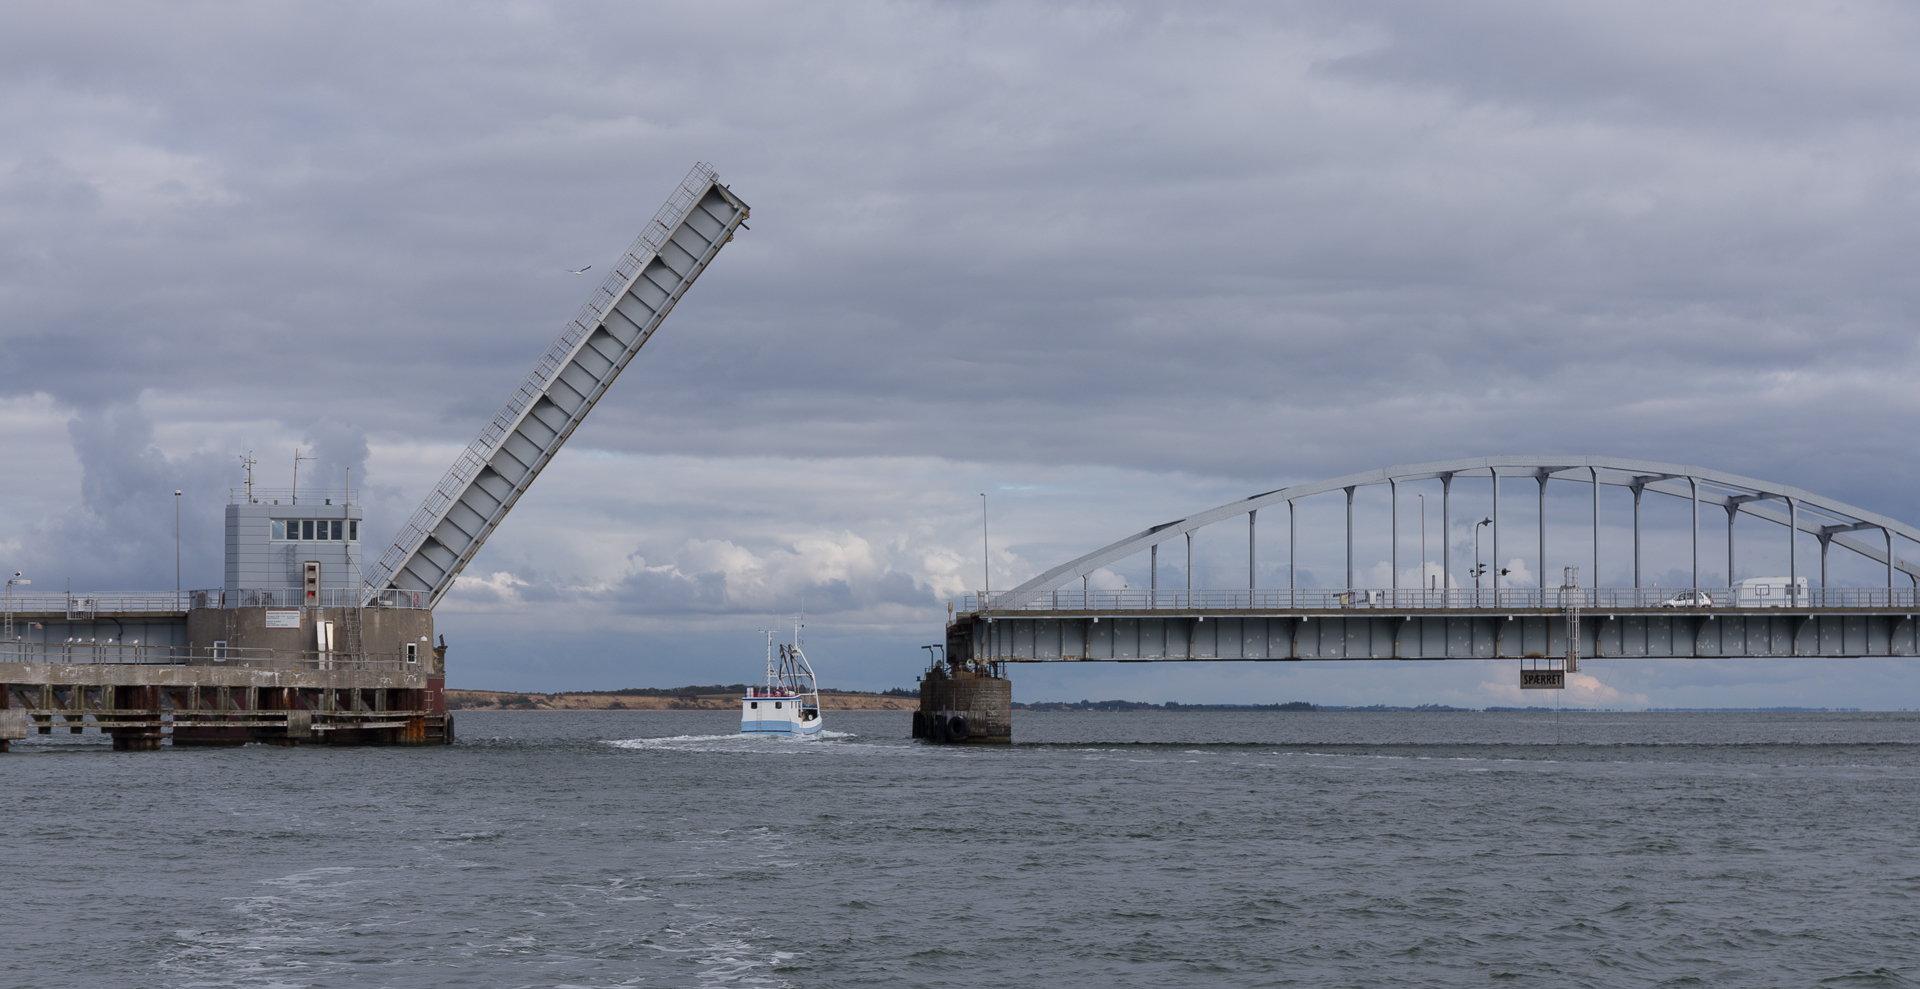 Oddesundbroen fra øst mod vest